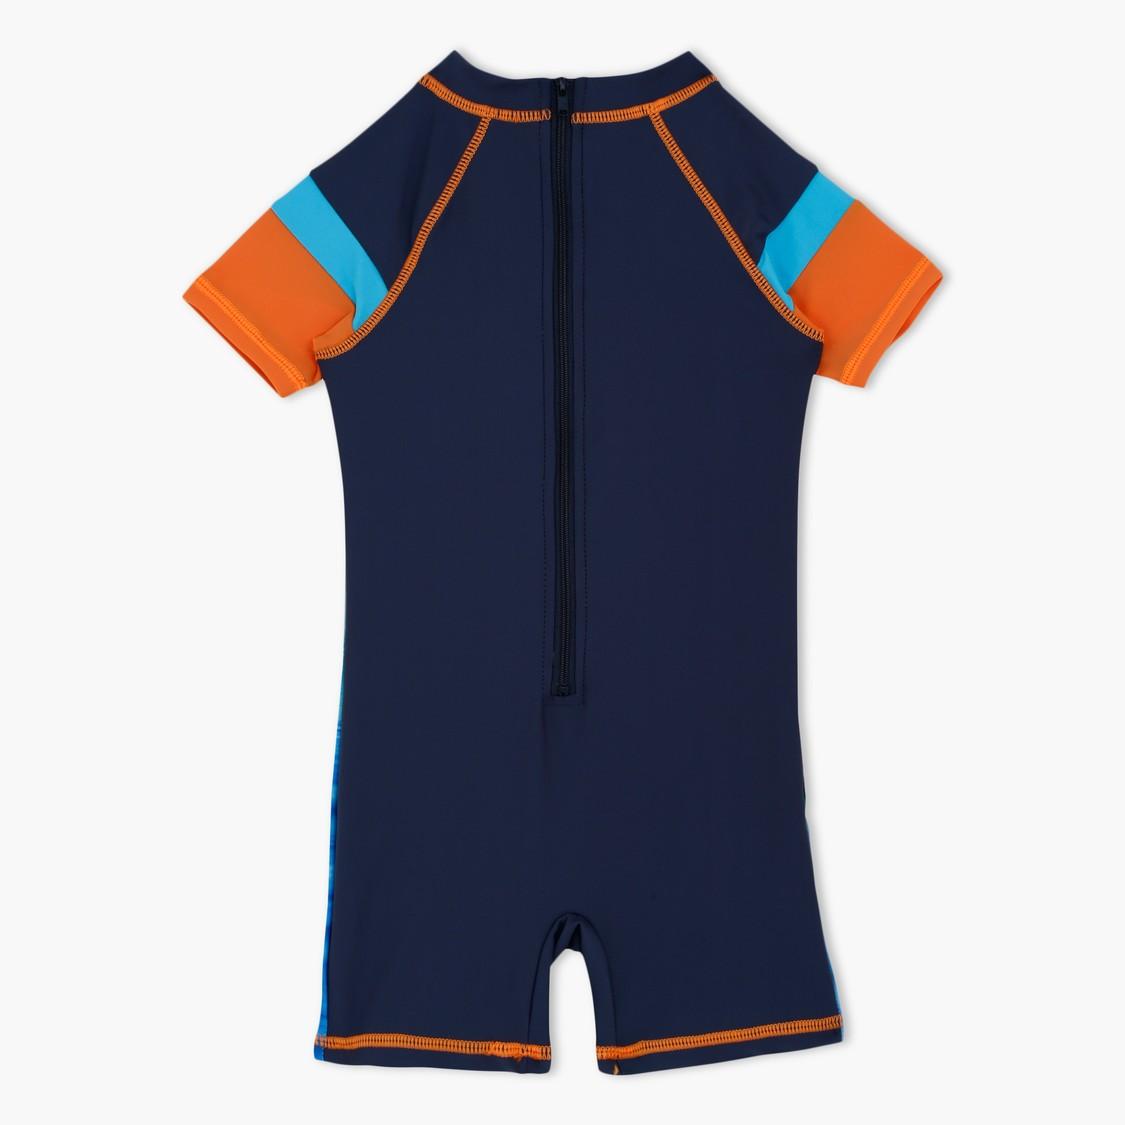 Printed Bodysuit with Short Sleeves